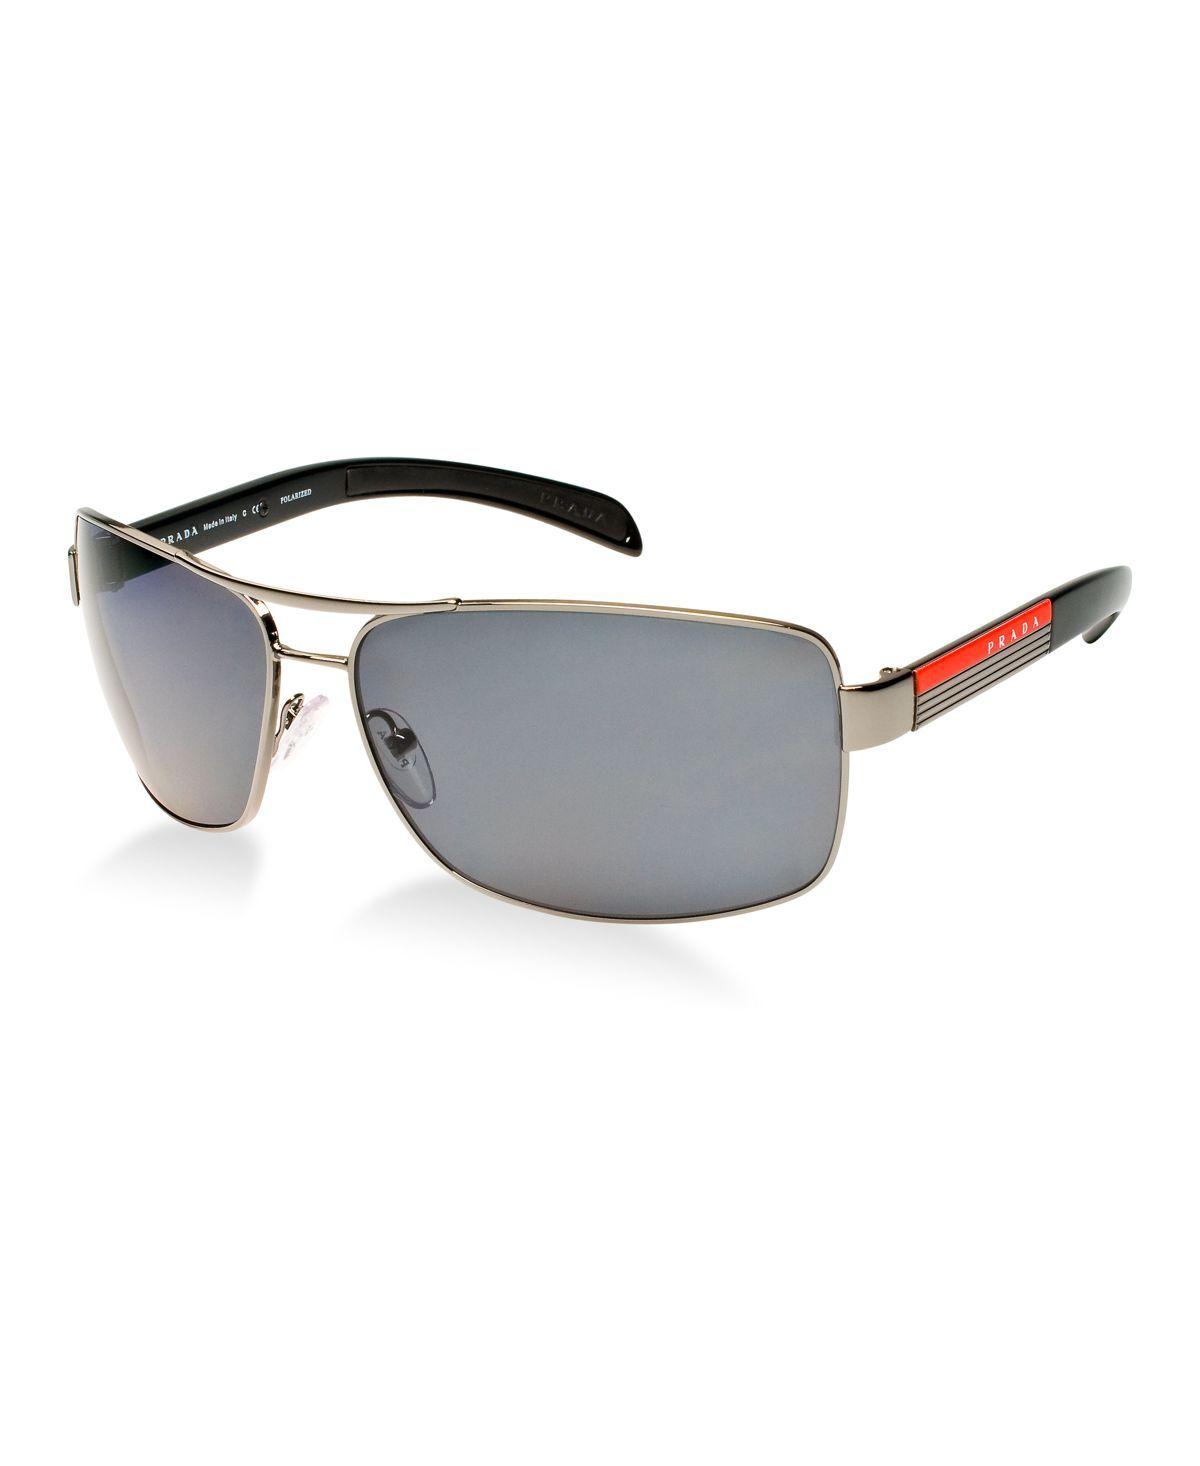 9e8b8bd3d9c0 Prada Linea Rossa Sunglasses, Ps 54IS | Date night ideas | Cheap ray ...